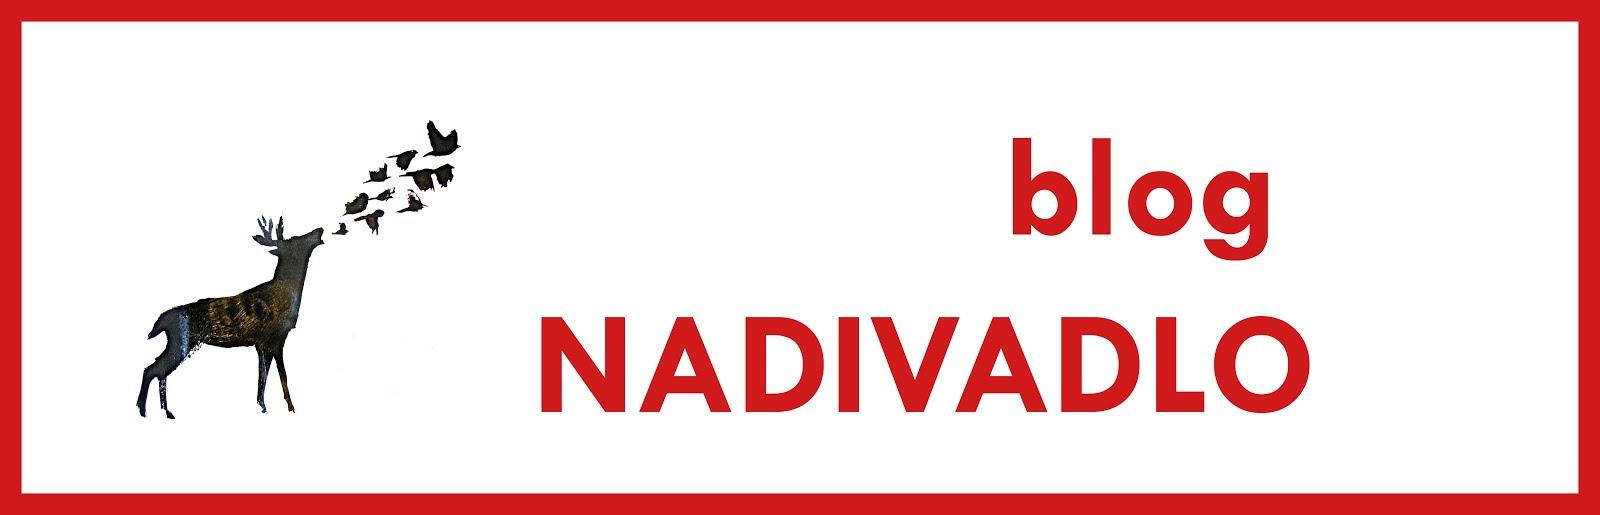 blog NADIVADLO